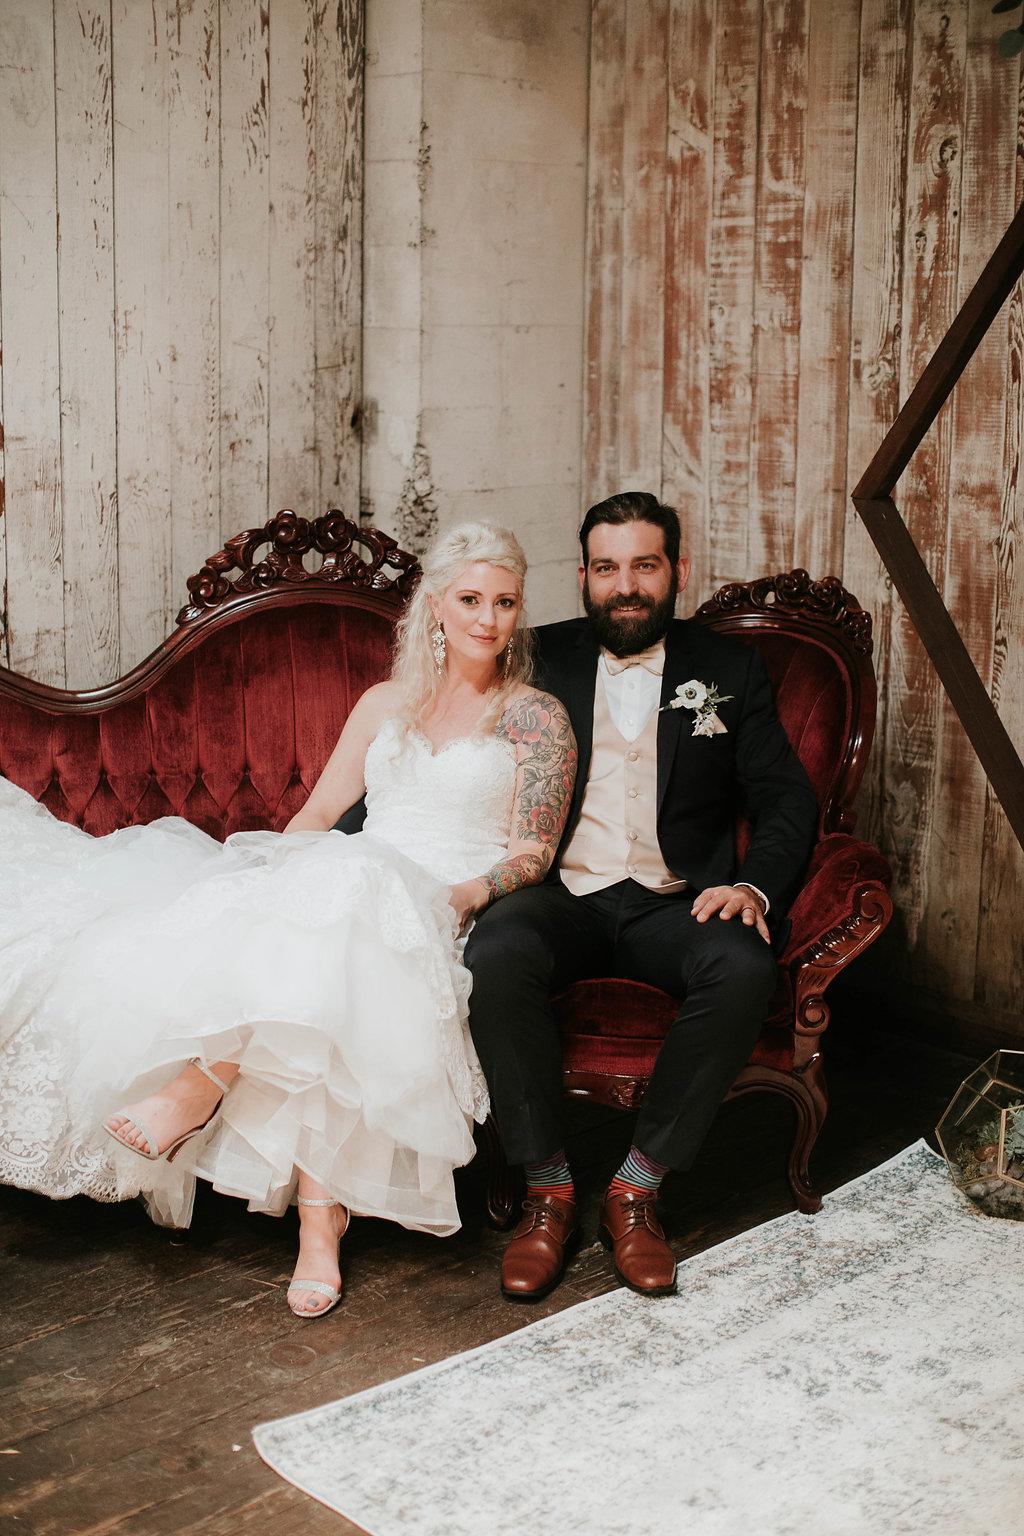 The_Big_Fake_wedding_Seattle_Within_sodo_wedding_by_Adina_Preston_Weddings_149.JPG